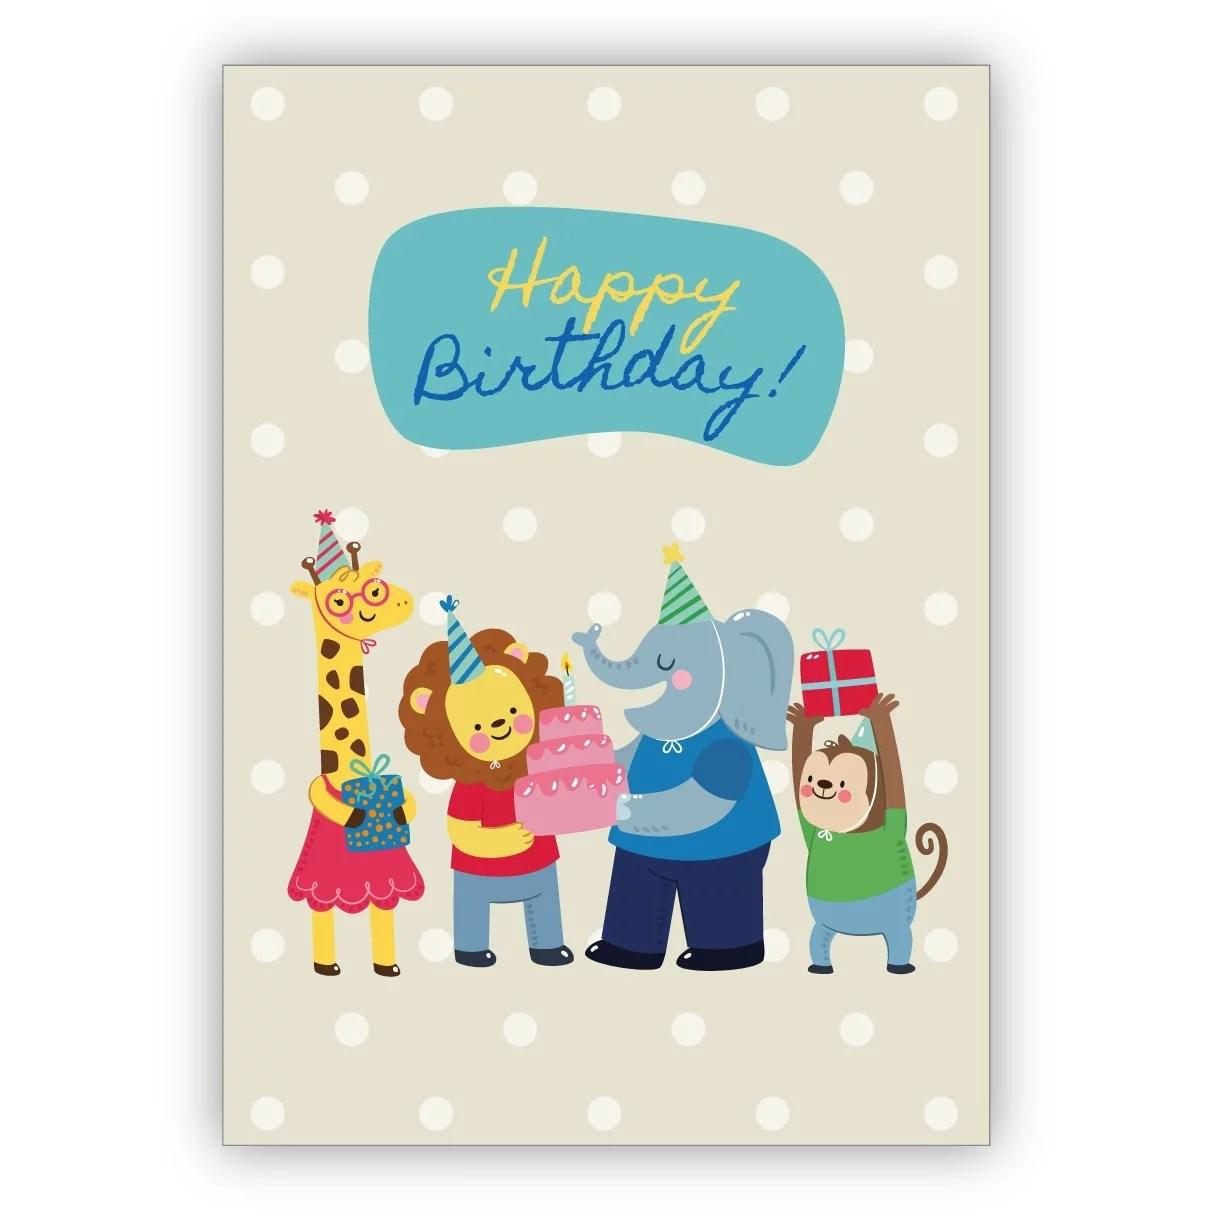 Schone Kinder Geburtstagskarte Zum 7 Geburtstag Mit Zirkus